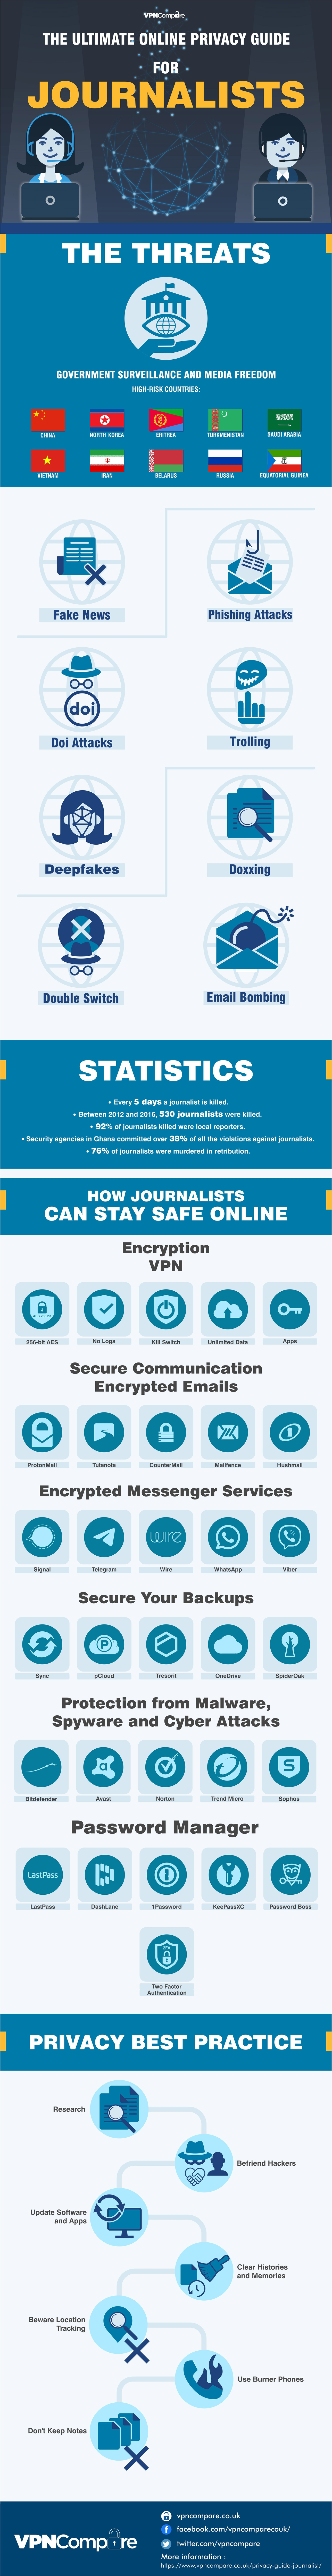 Infographic on Journalist Online Safety